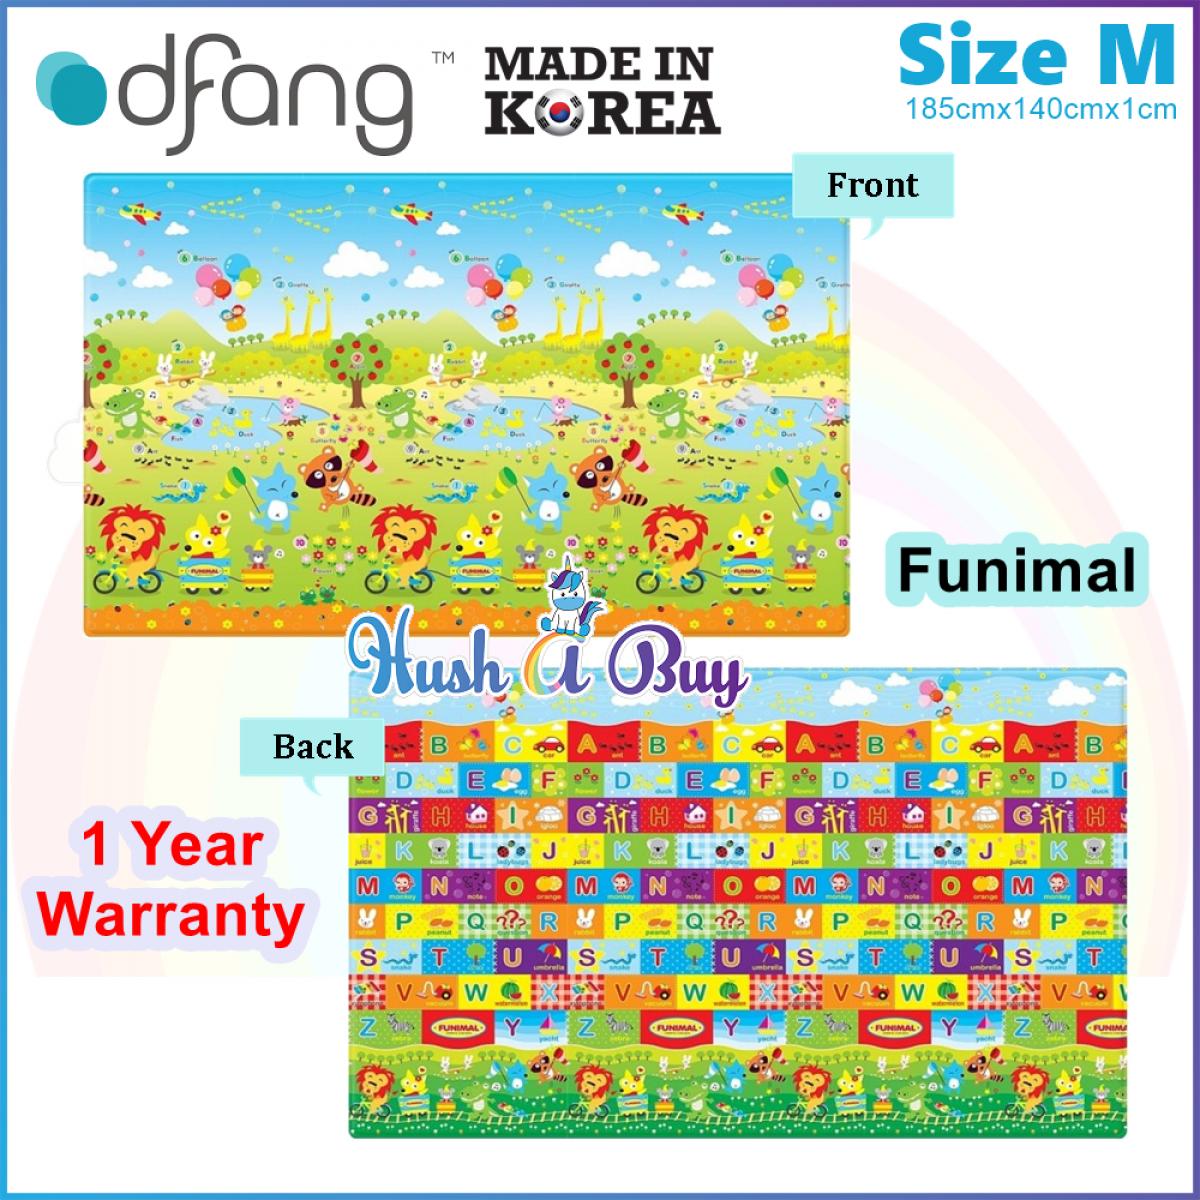 Dfang Double Film Premium PVC Mat (185x140x1.0cm) Size M - Made in Korea -1 Year Warranty